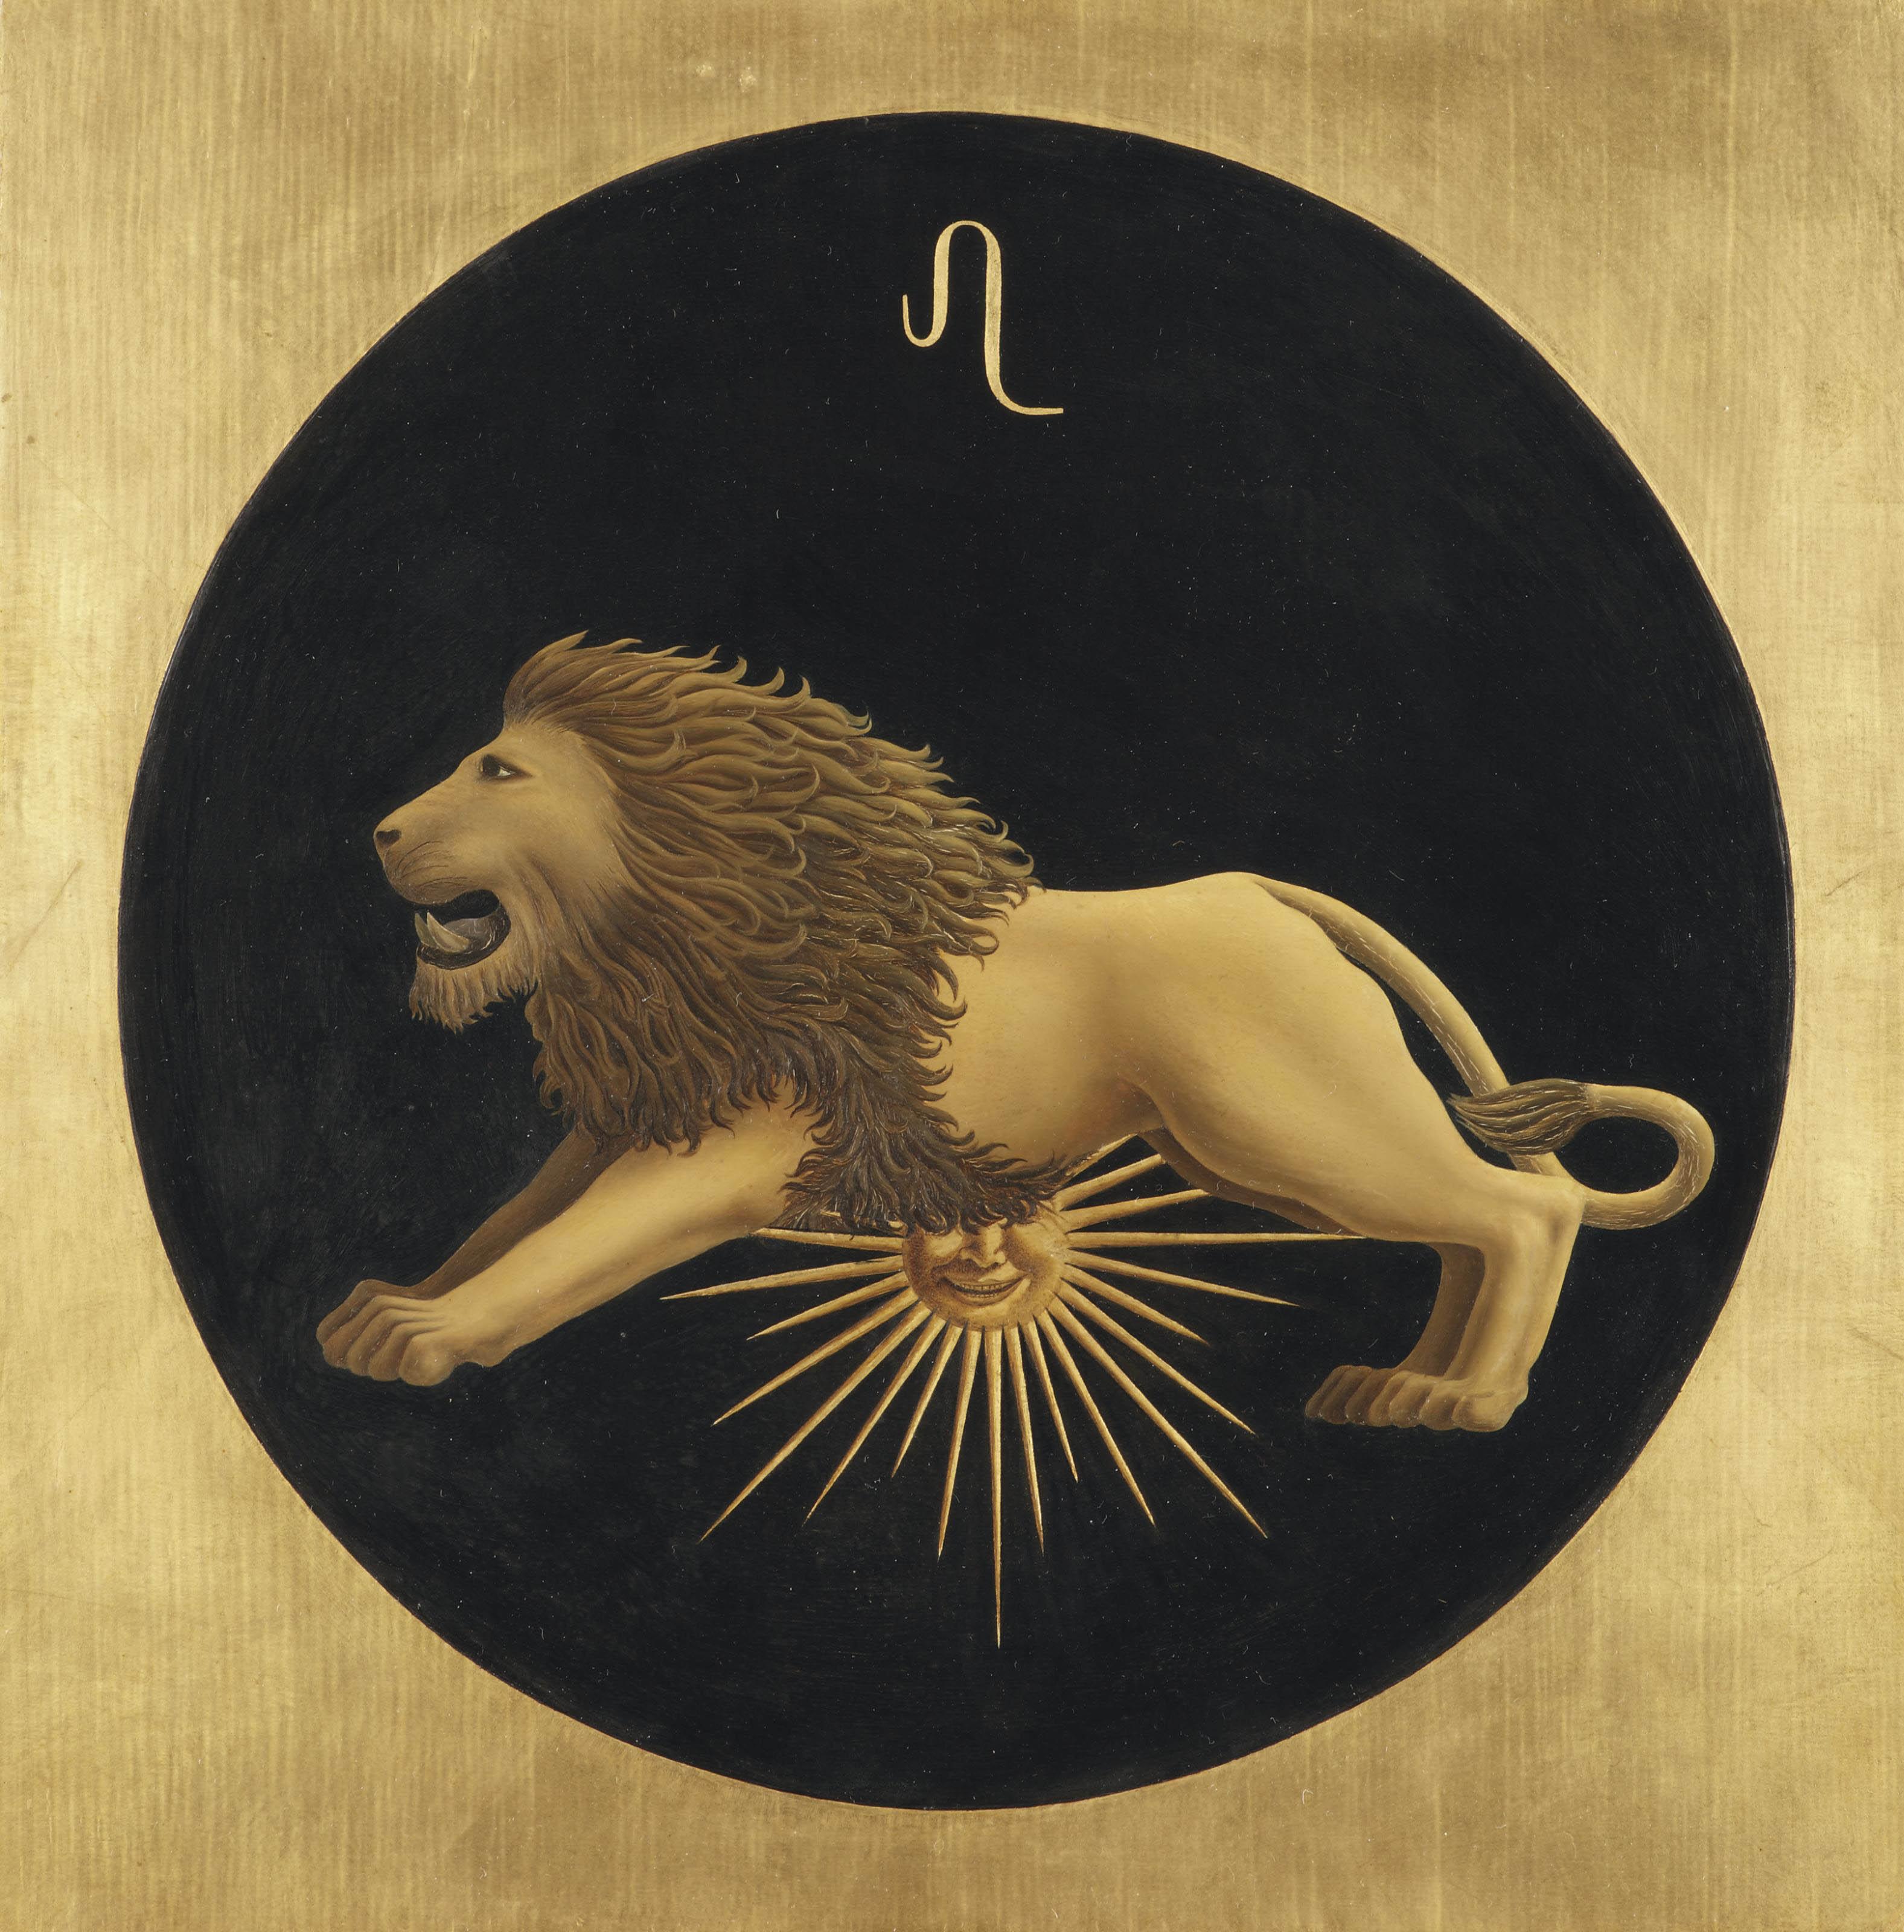 Leeuw; lion